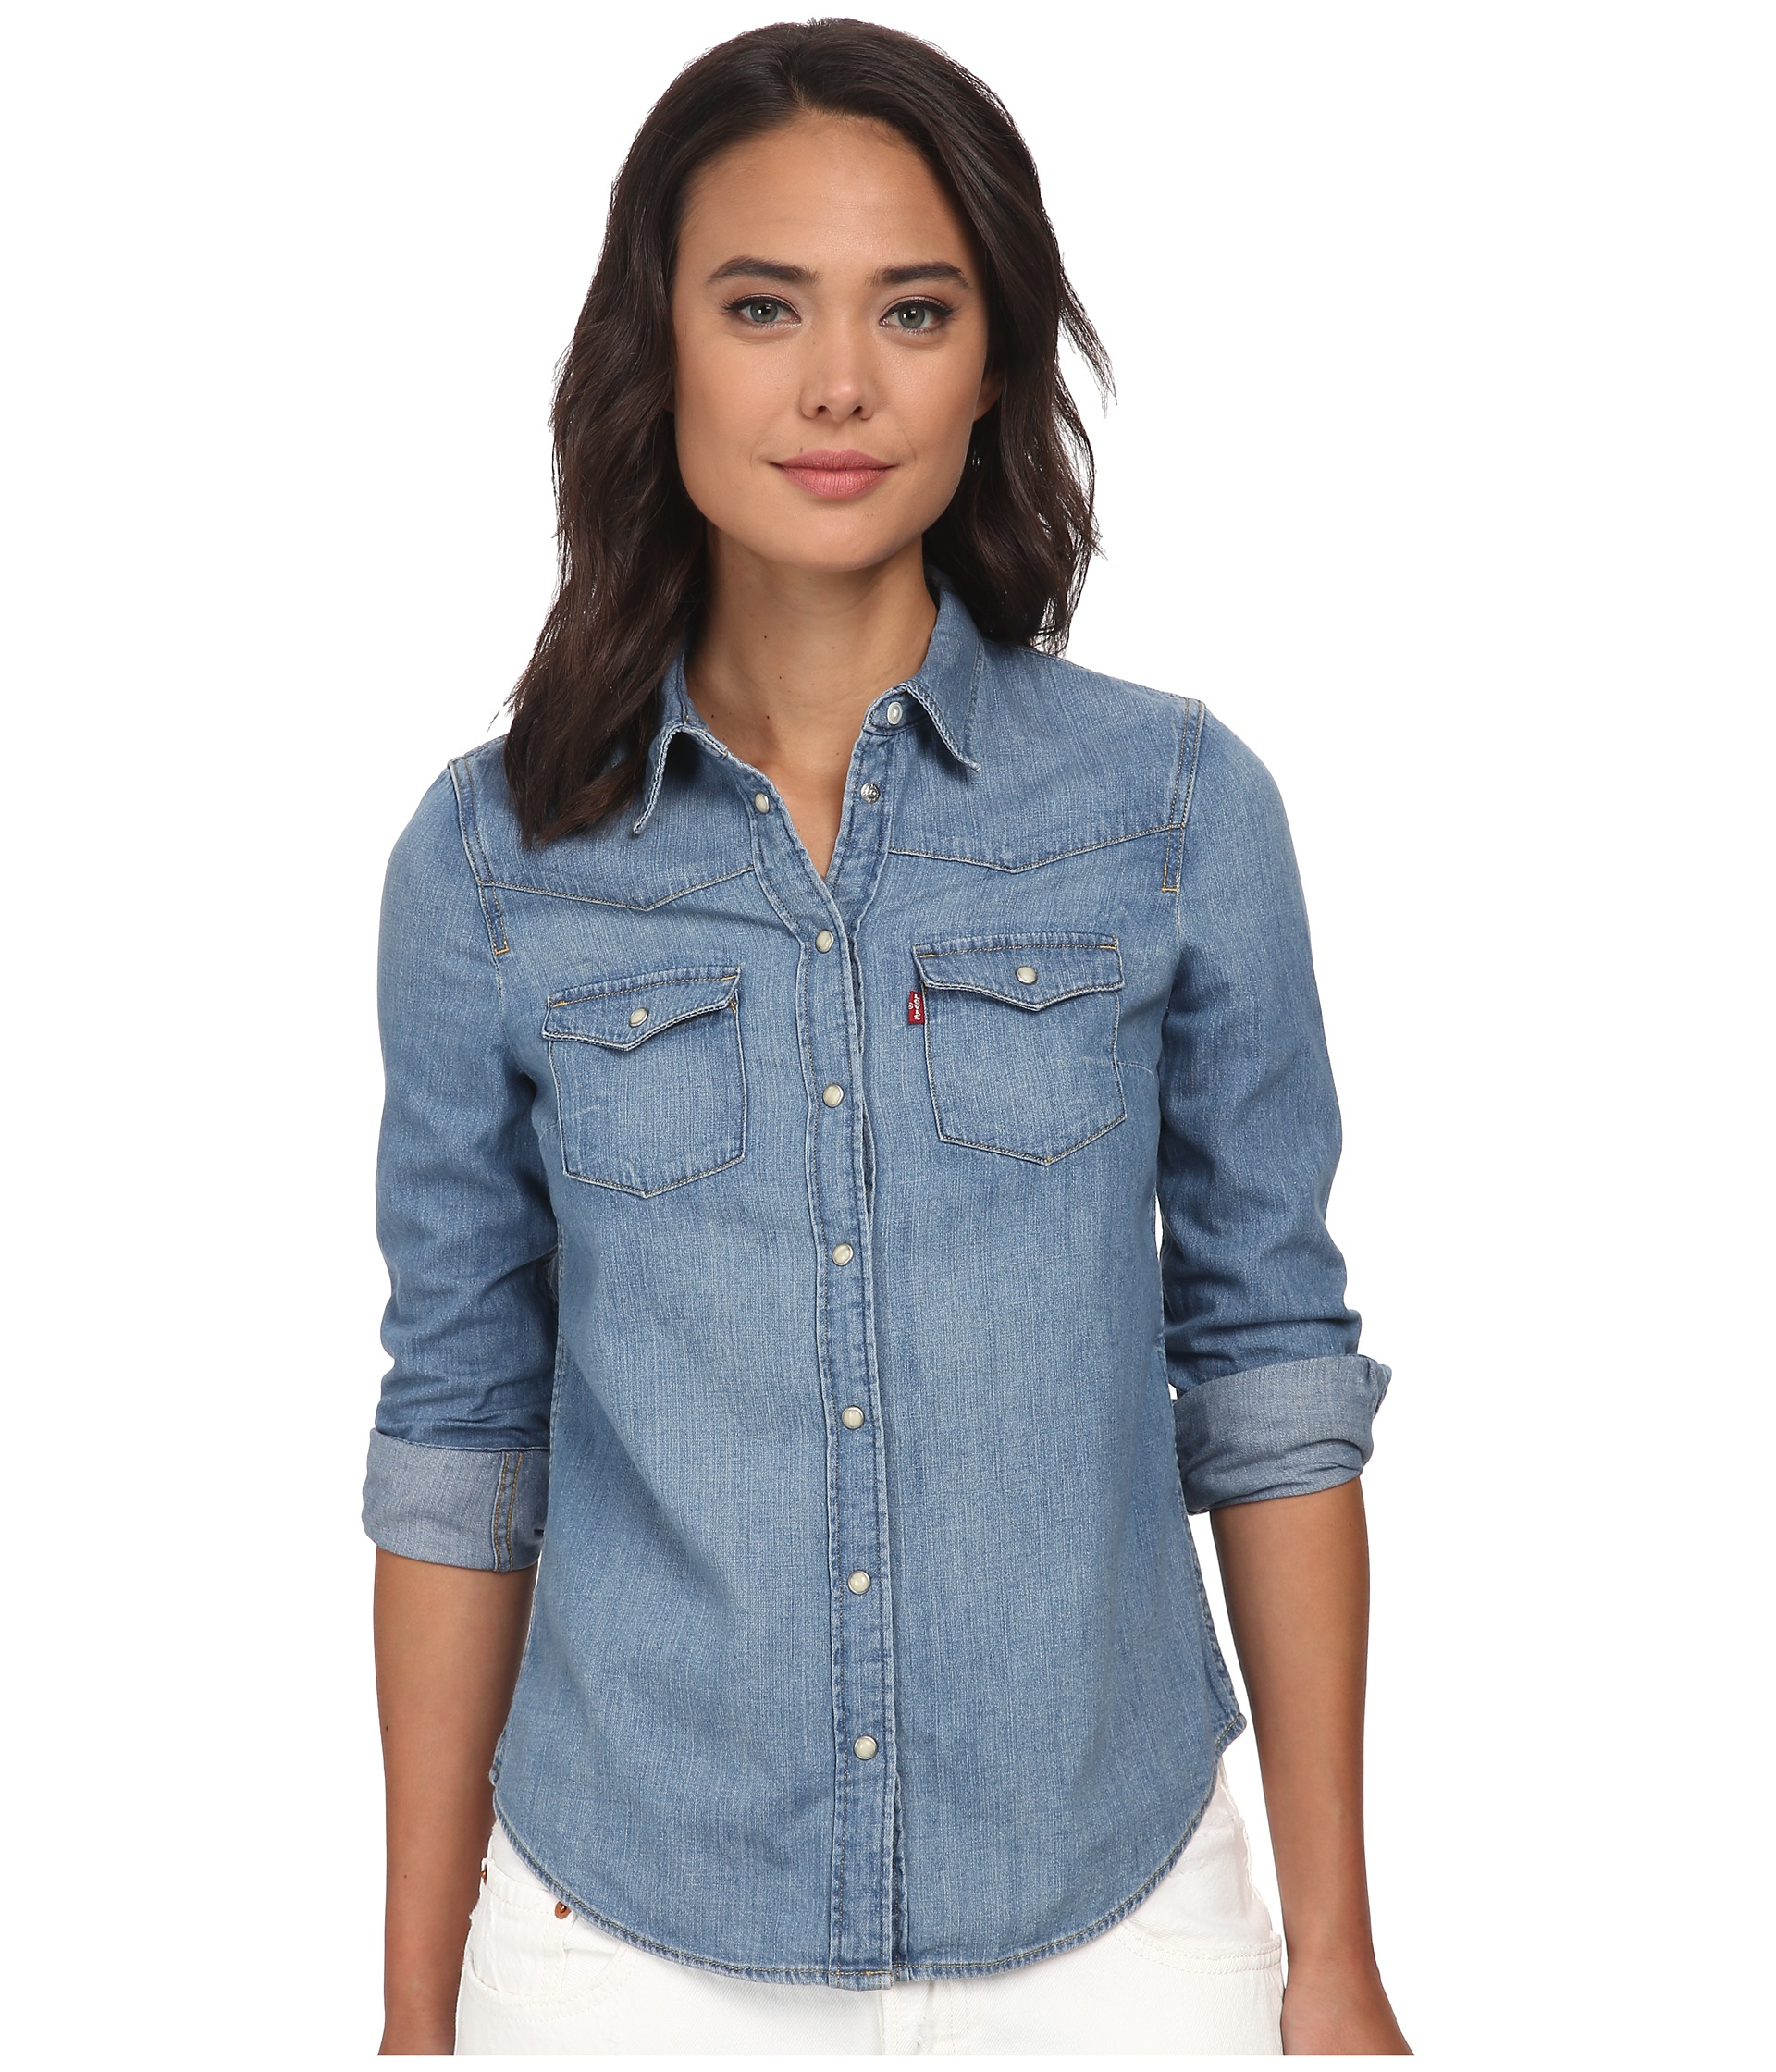 levi 39 s womens modern western shirt medium heritage. Black Bedroom Furniture Sets. Home Design Ideas